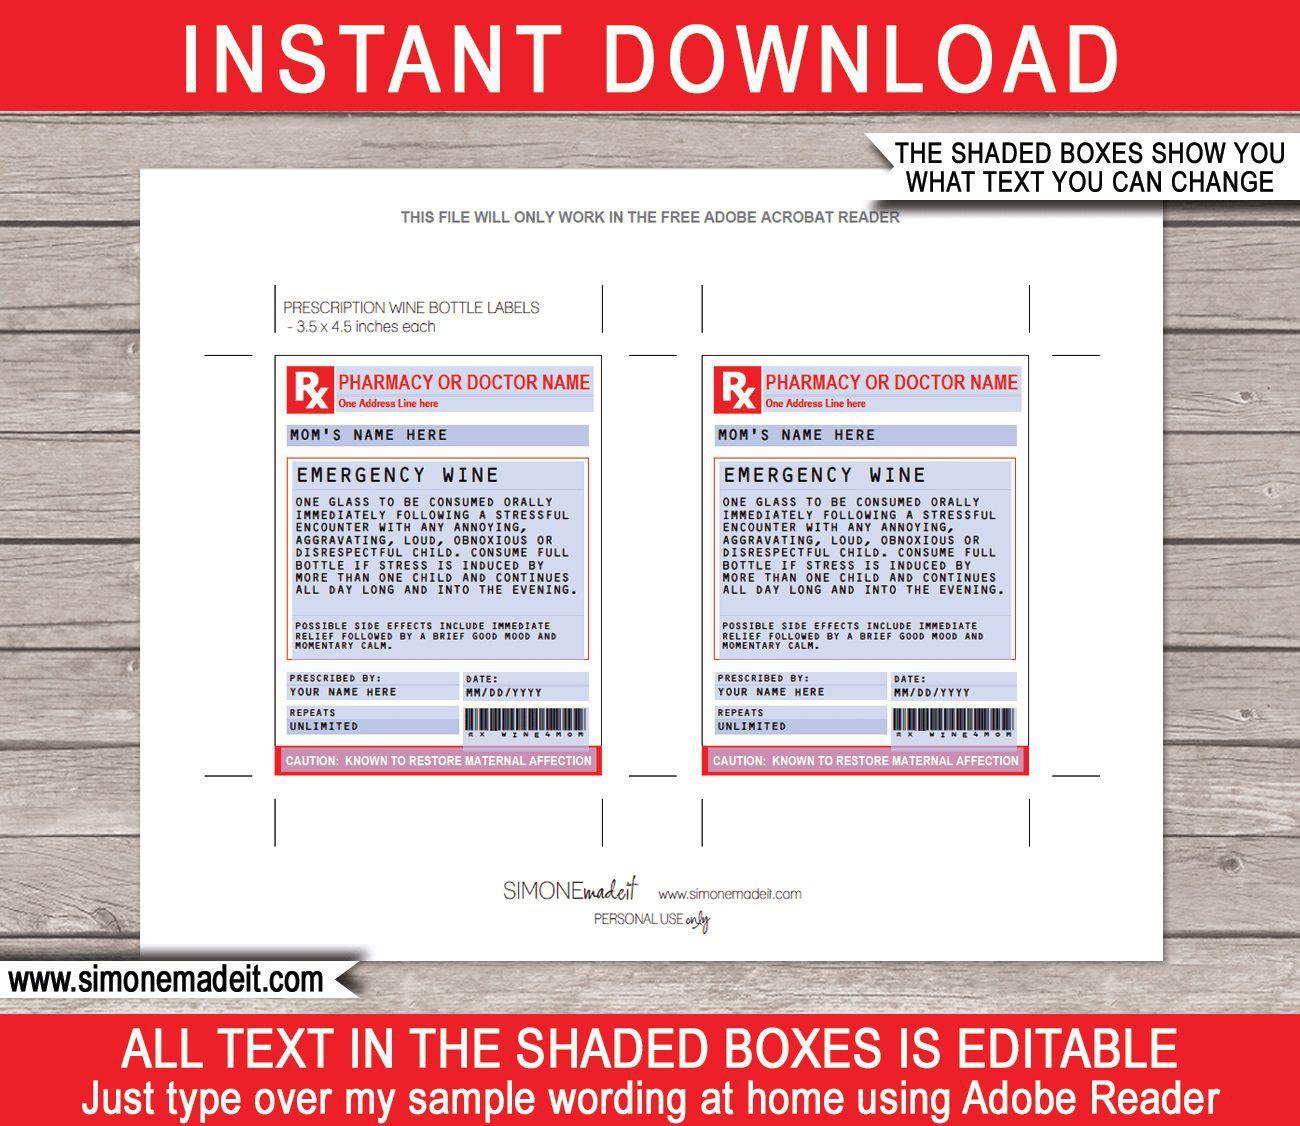 002 Singular Free Fake Prescription Label Template High Def Full